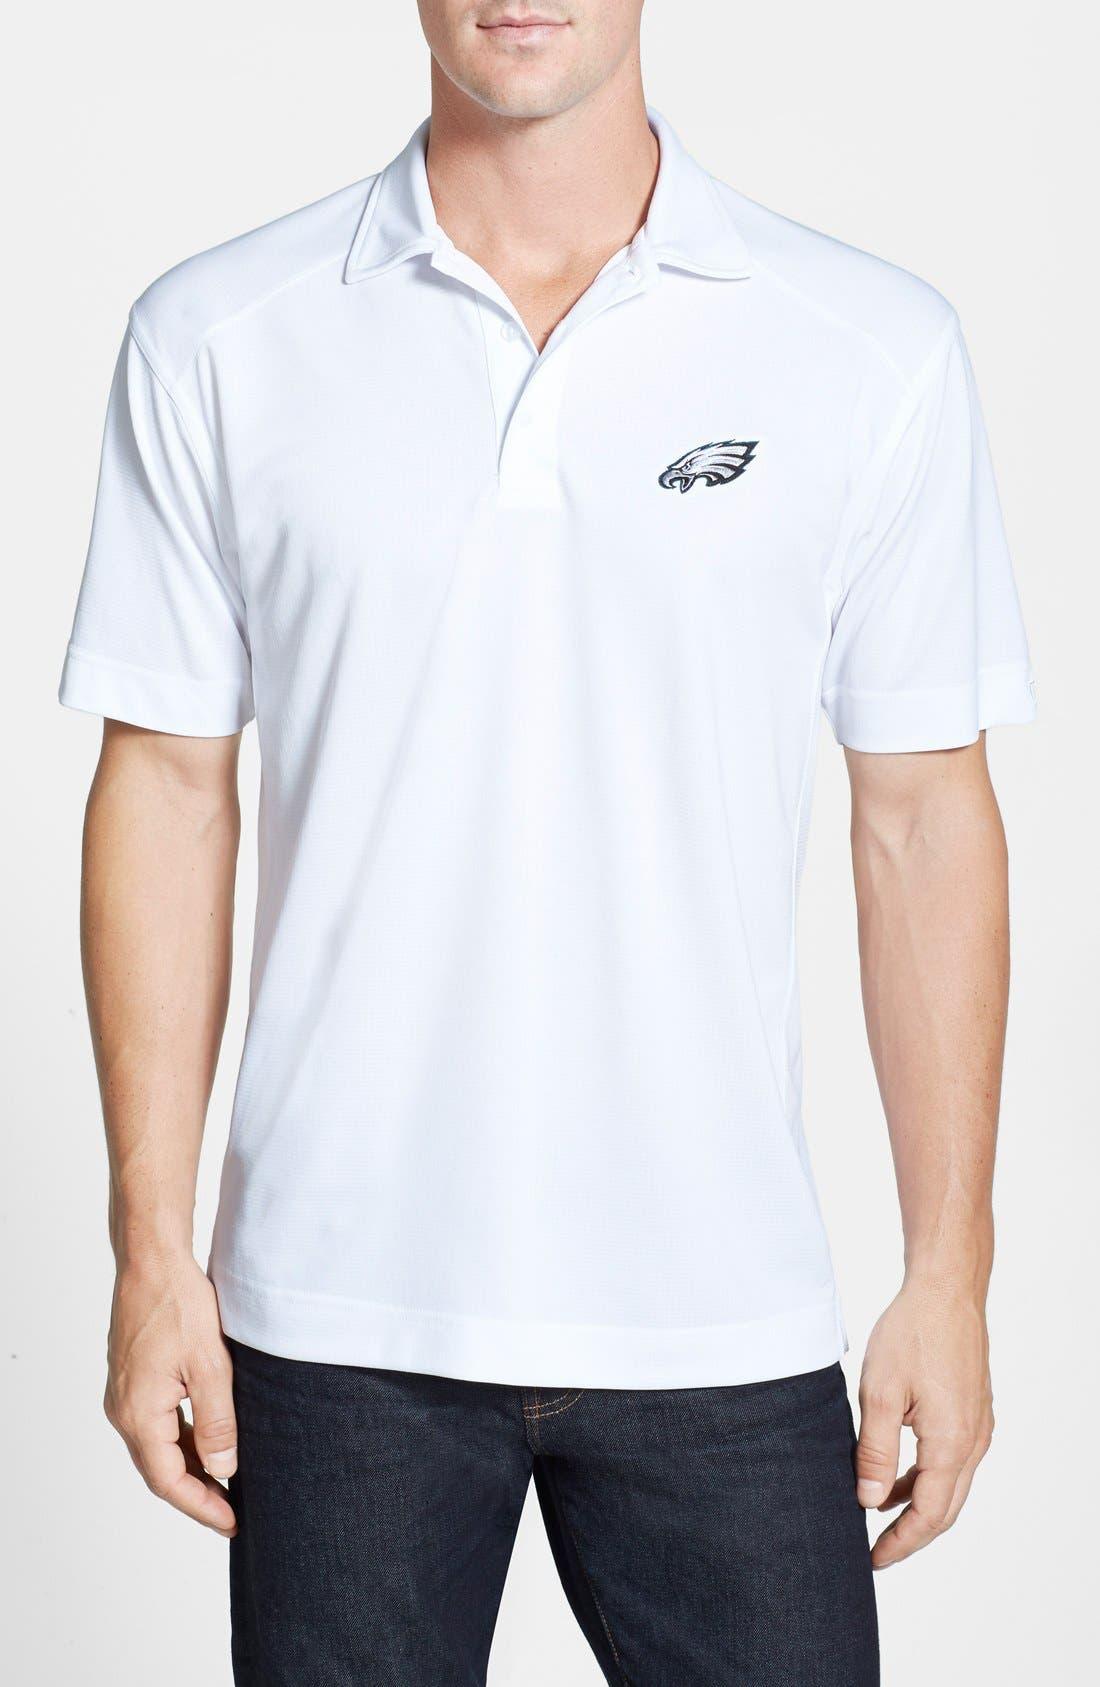 Philadelphia Eagles - Genre DryTec Moisture Wicking Polo,                         Main,                         color, White